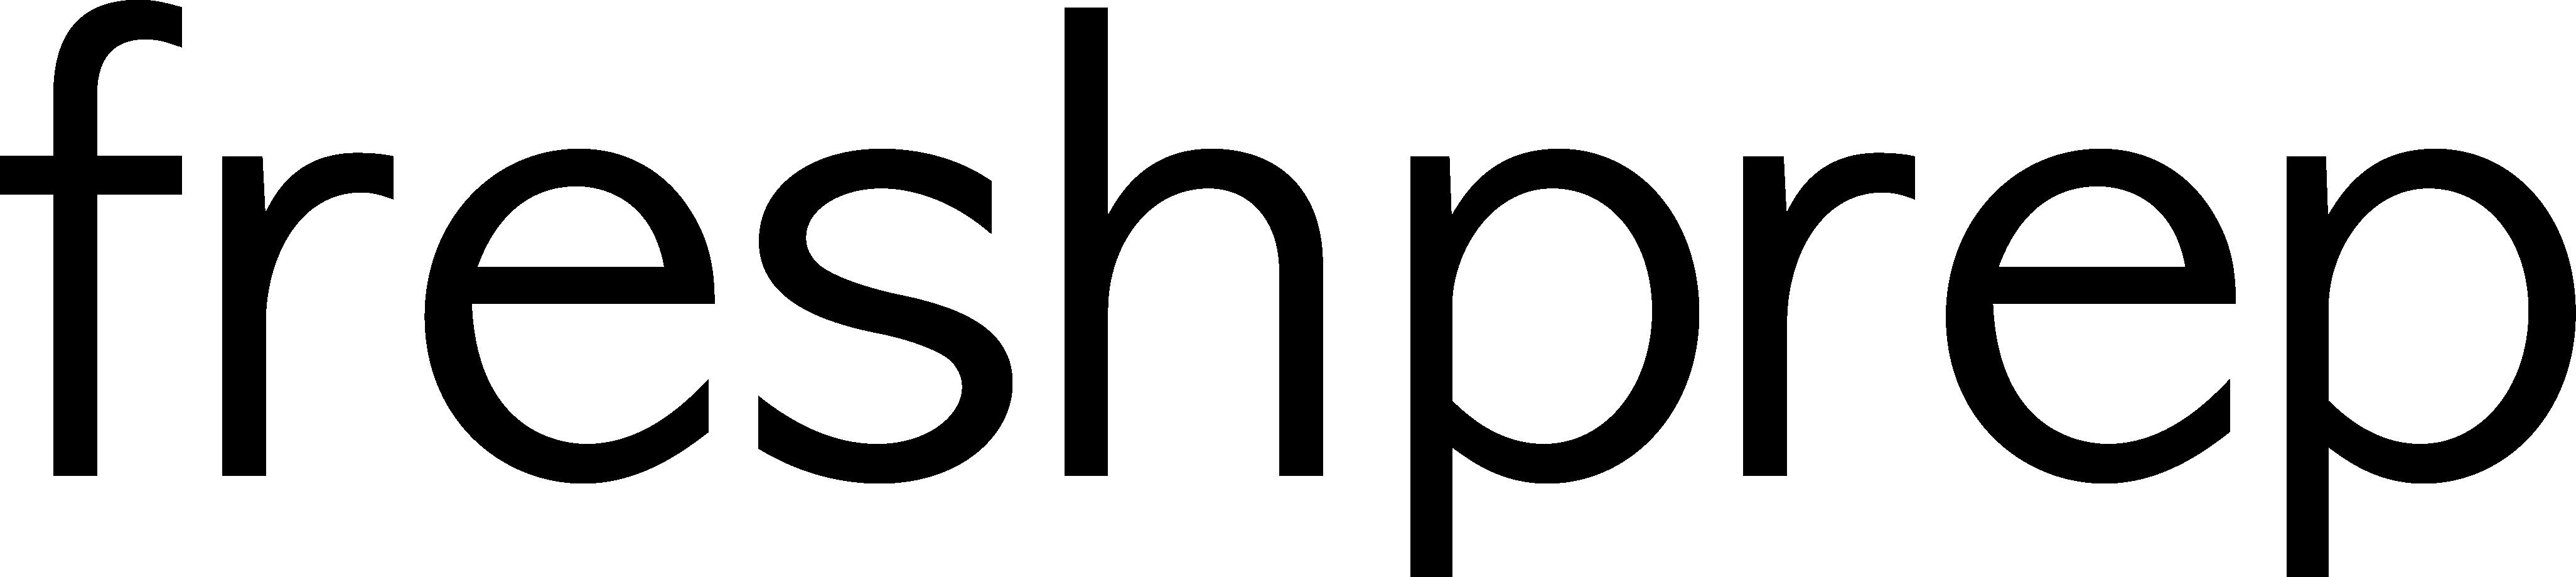 FP-Logo_PrimaryLogo-Black-sm_1000px